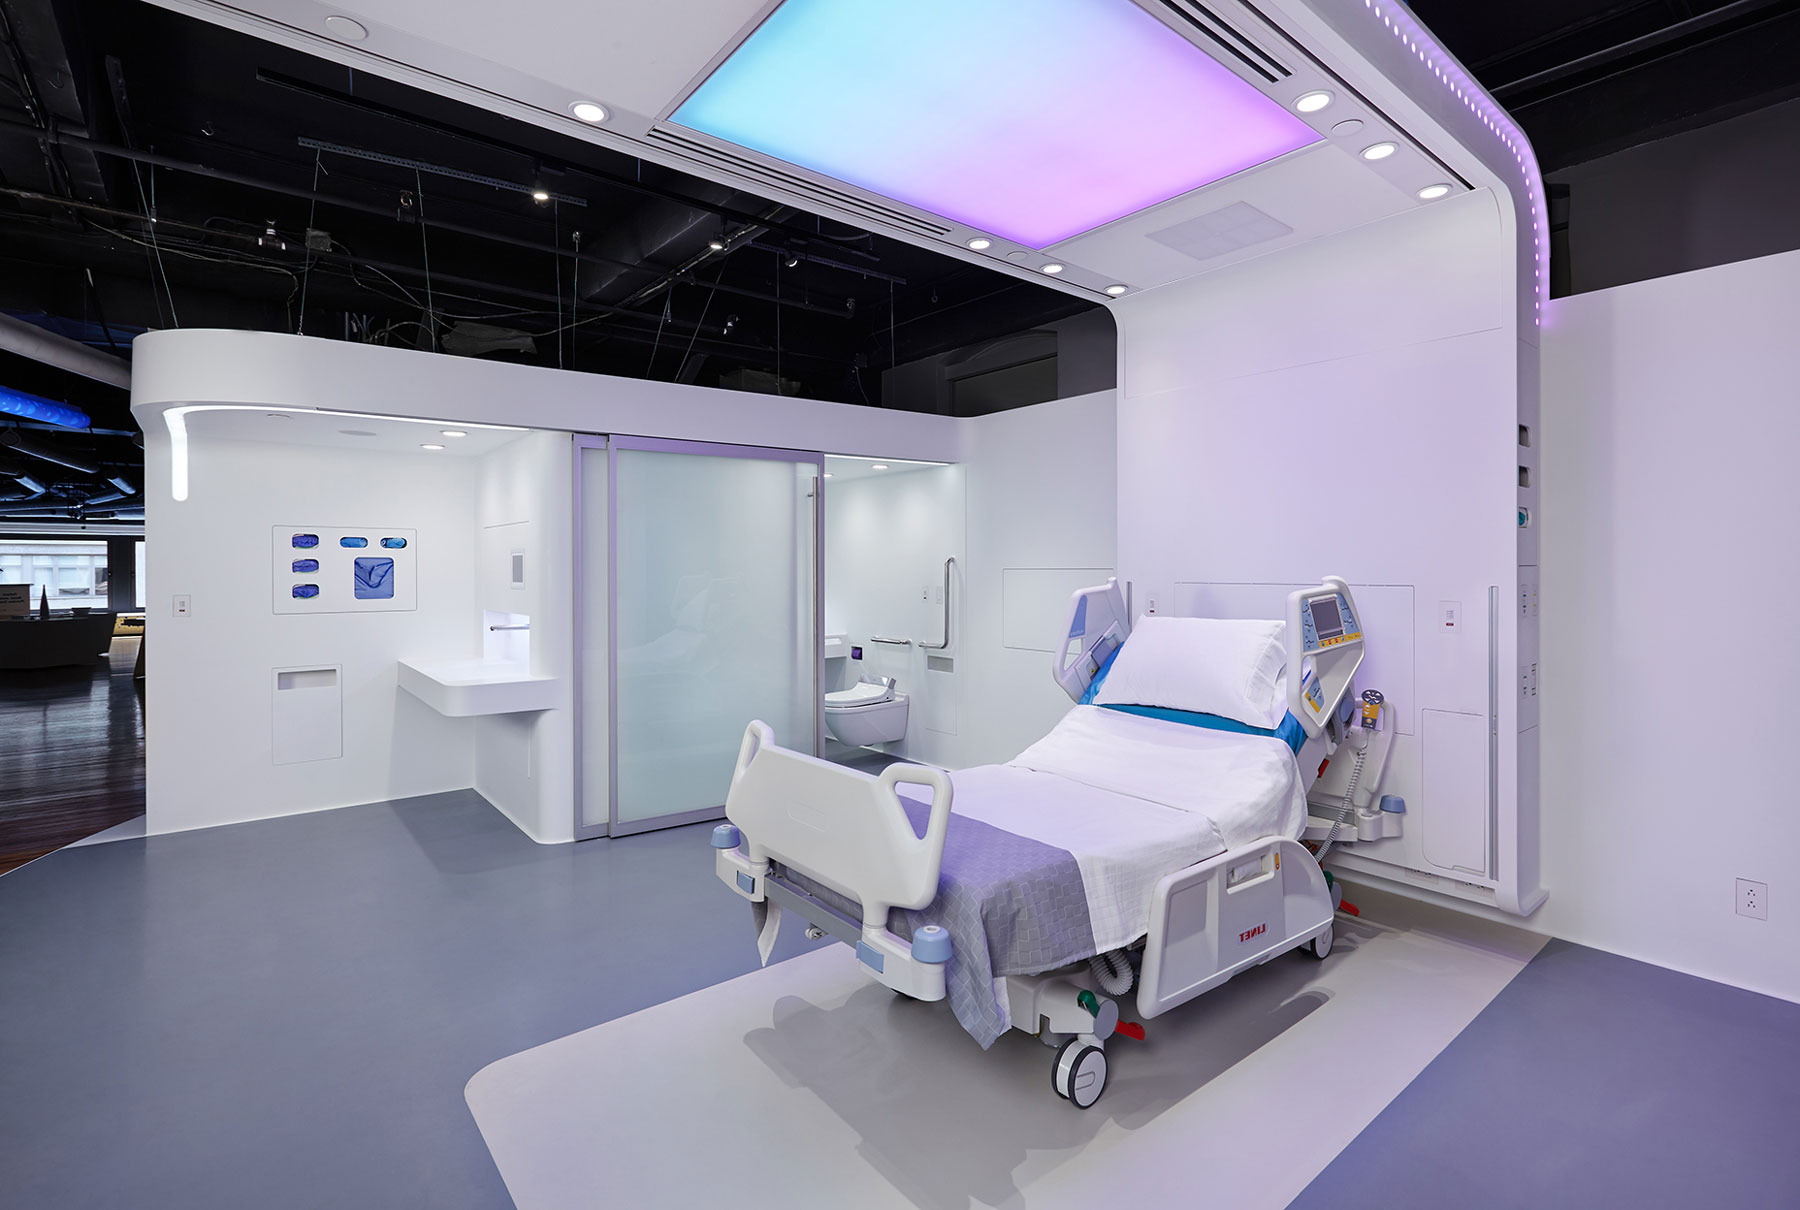 hospital-lighting-design-for-nxt-health-pr202